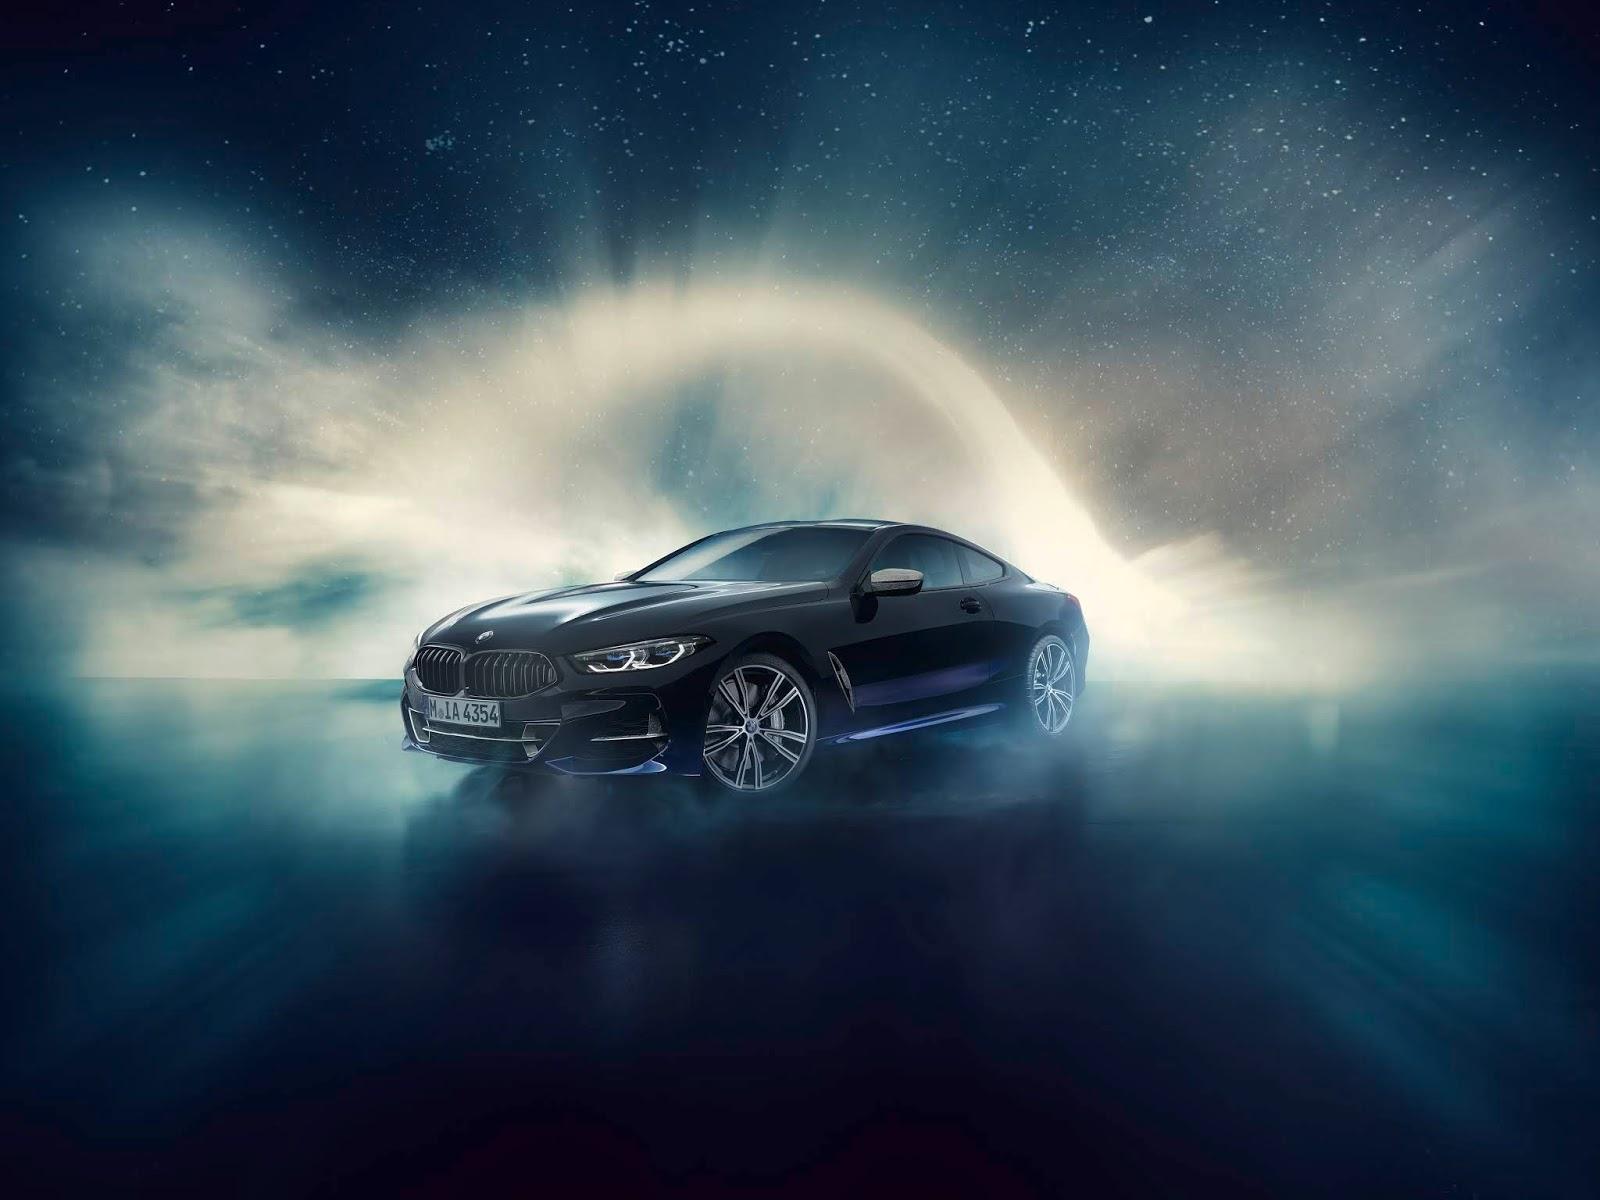 P90333163 highRes the all new bmw indi Τα αστέρια της BMW για τη 89η Διεθνή Έκθεση Αυτοκινήτου της Γενεύης BMW, BMW 7-series, Electric cars, Hybrid, Έκθεση, Έκθεση Γενεύης